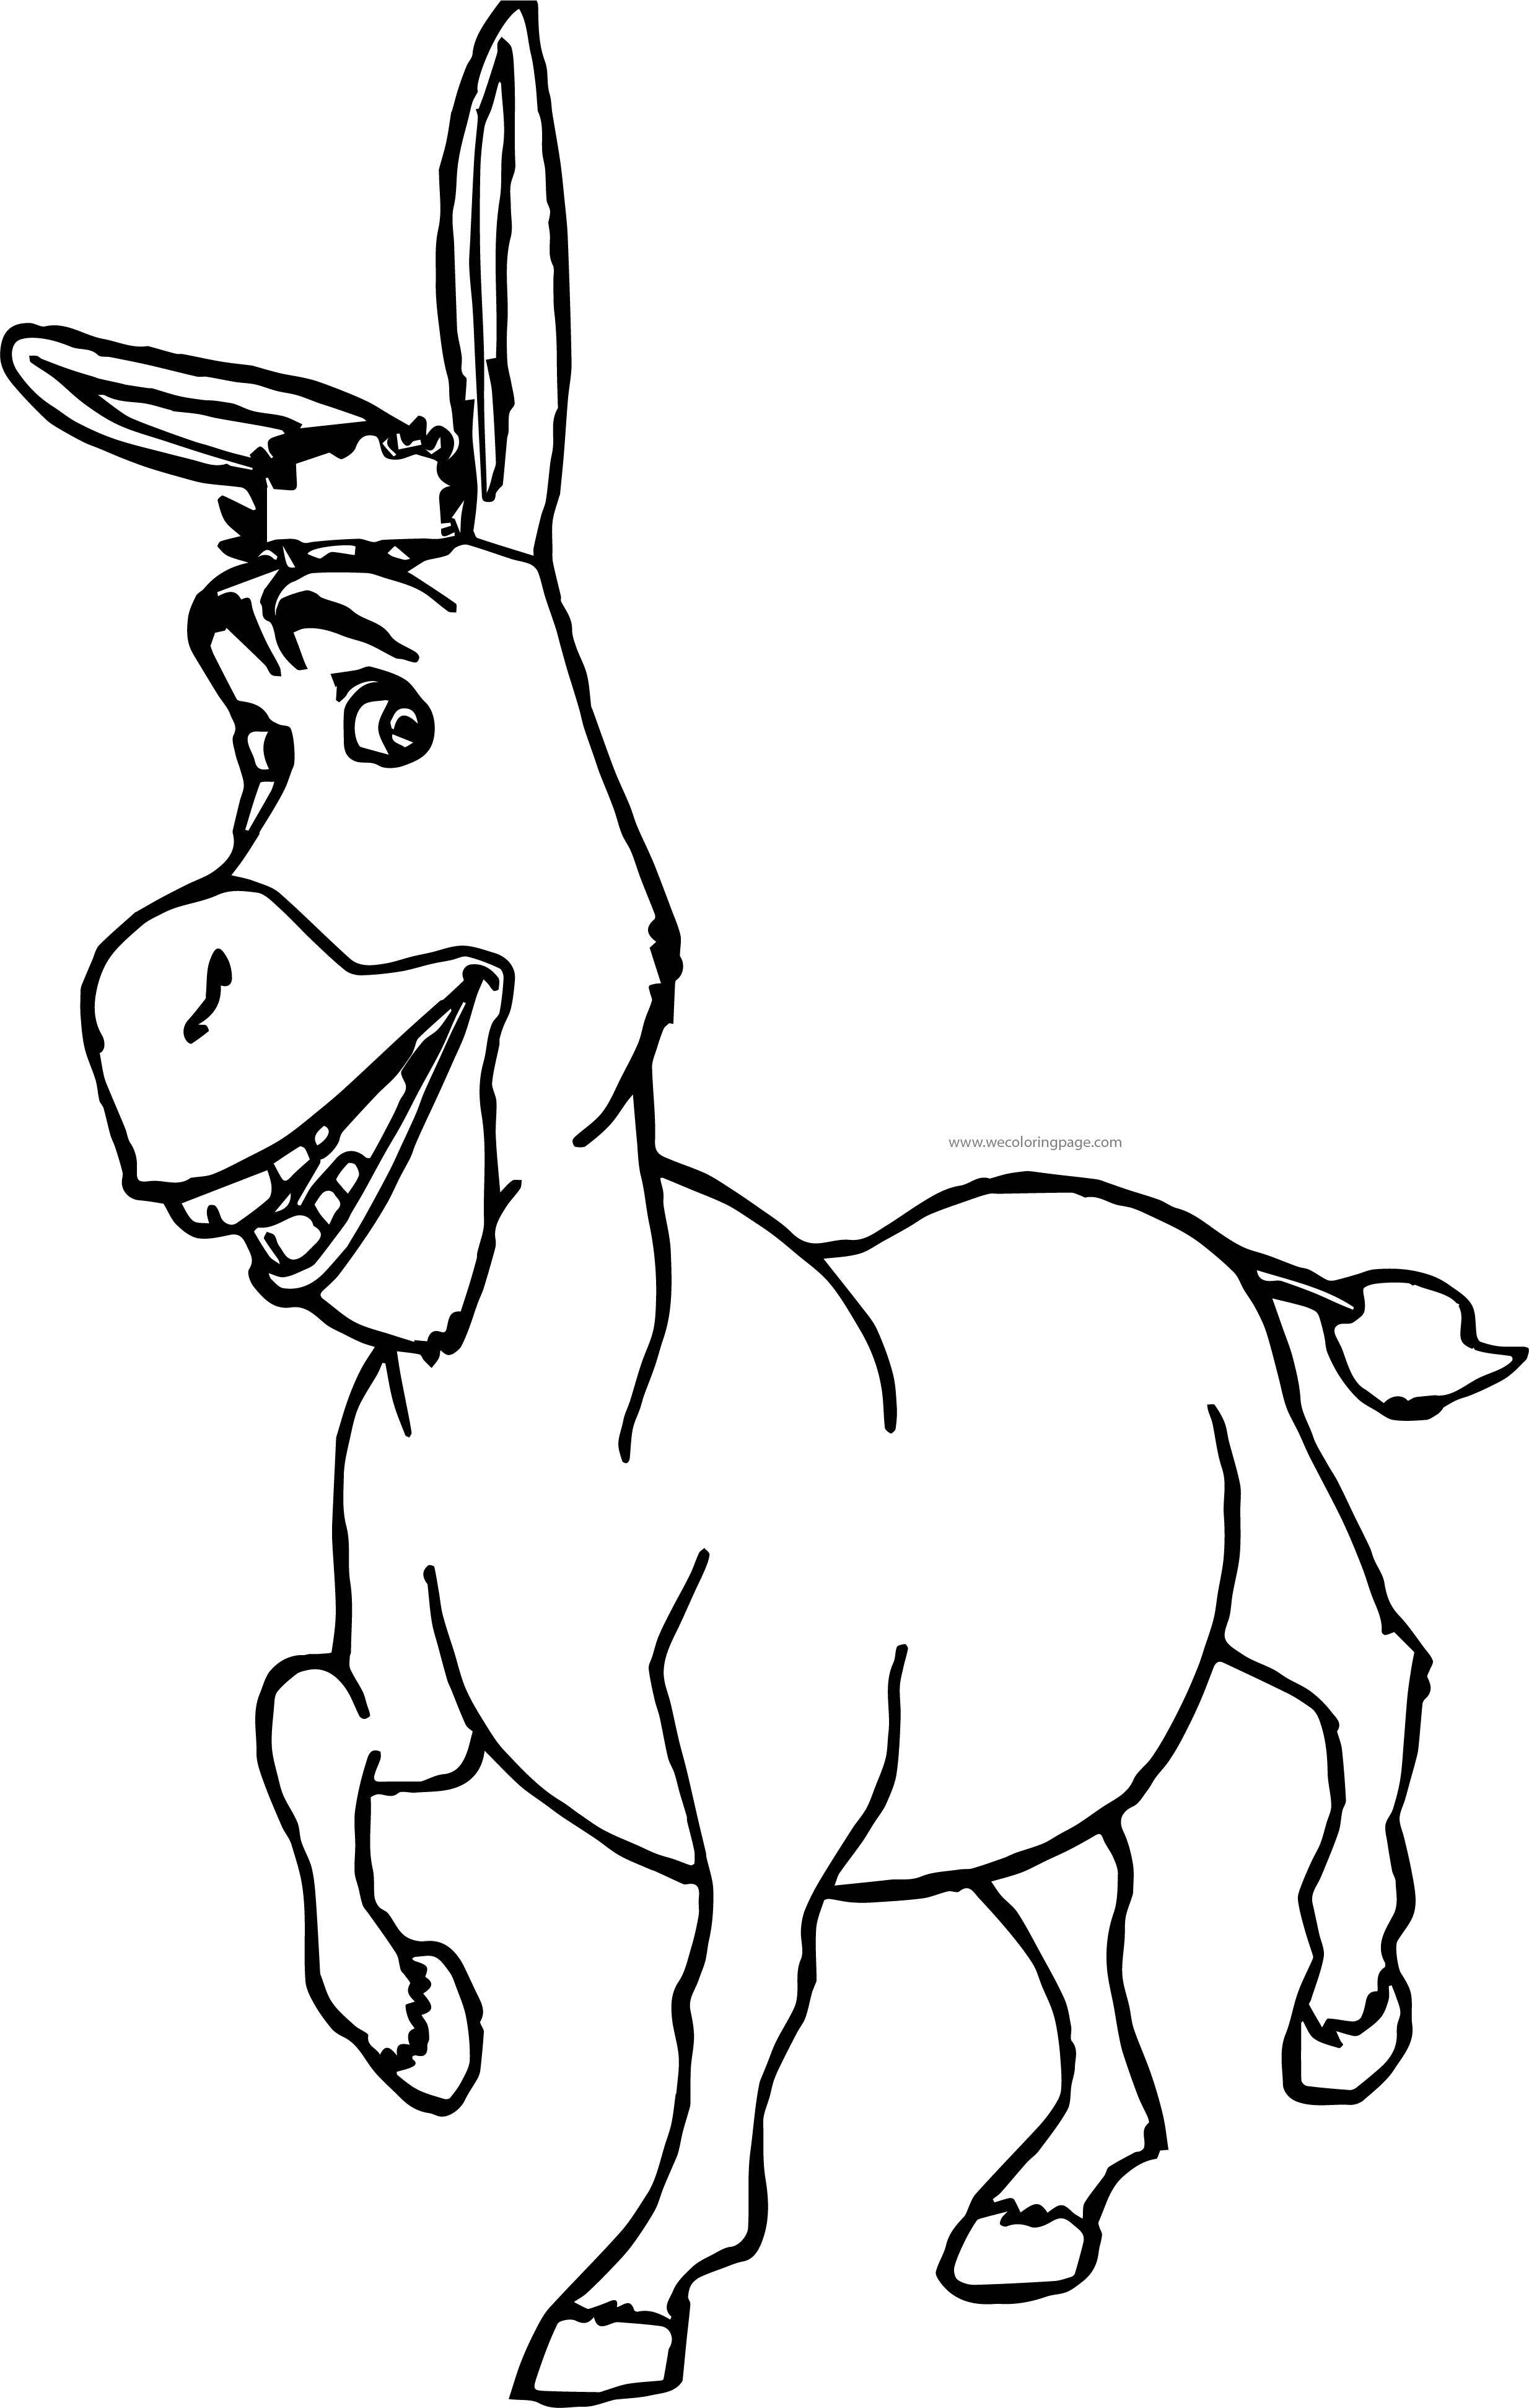 Pin by Wecoloring Page on wecoloringpage | Pinterest | Shrek donkey